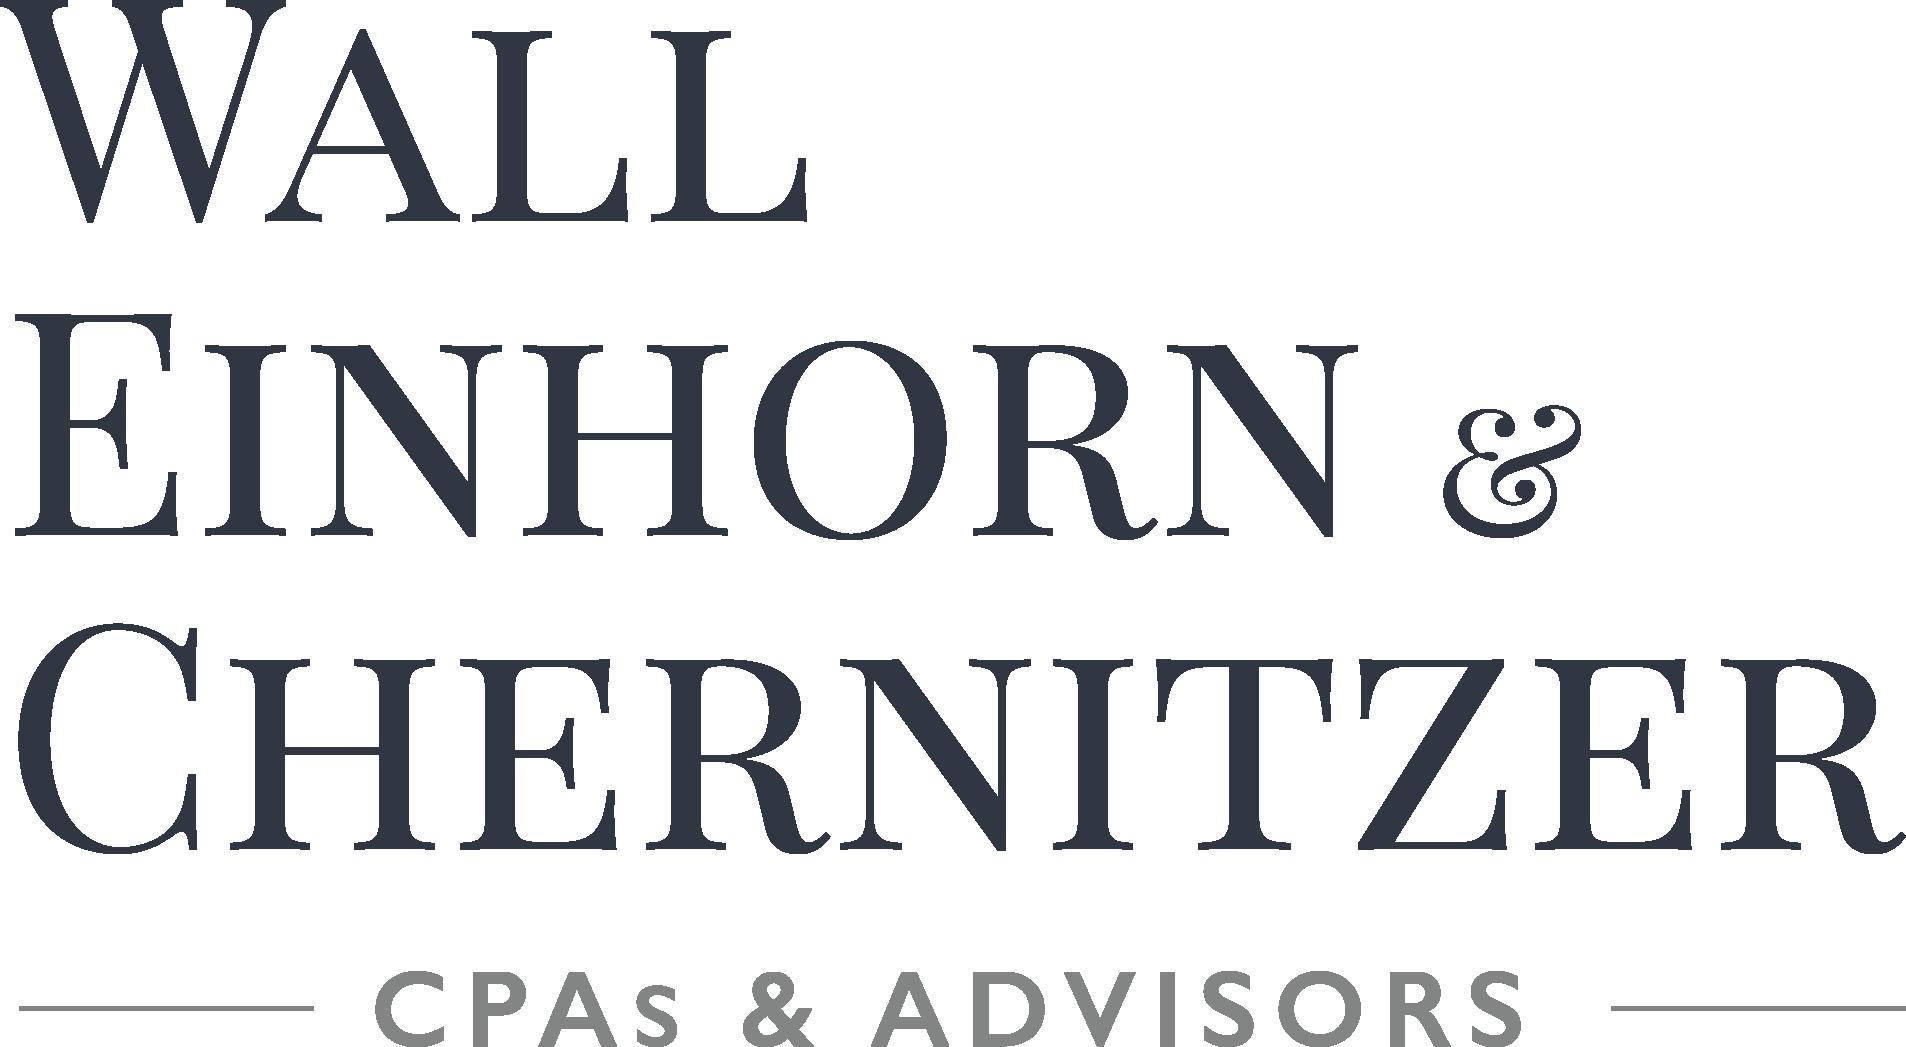 Wall, Einhorn & Chernitzer, P.C. logo